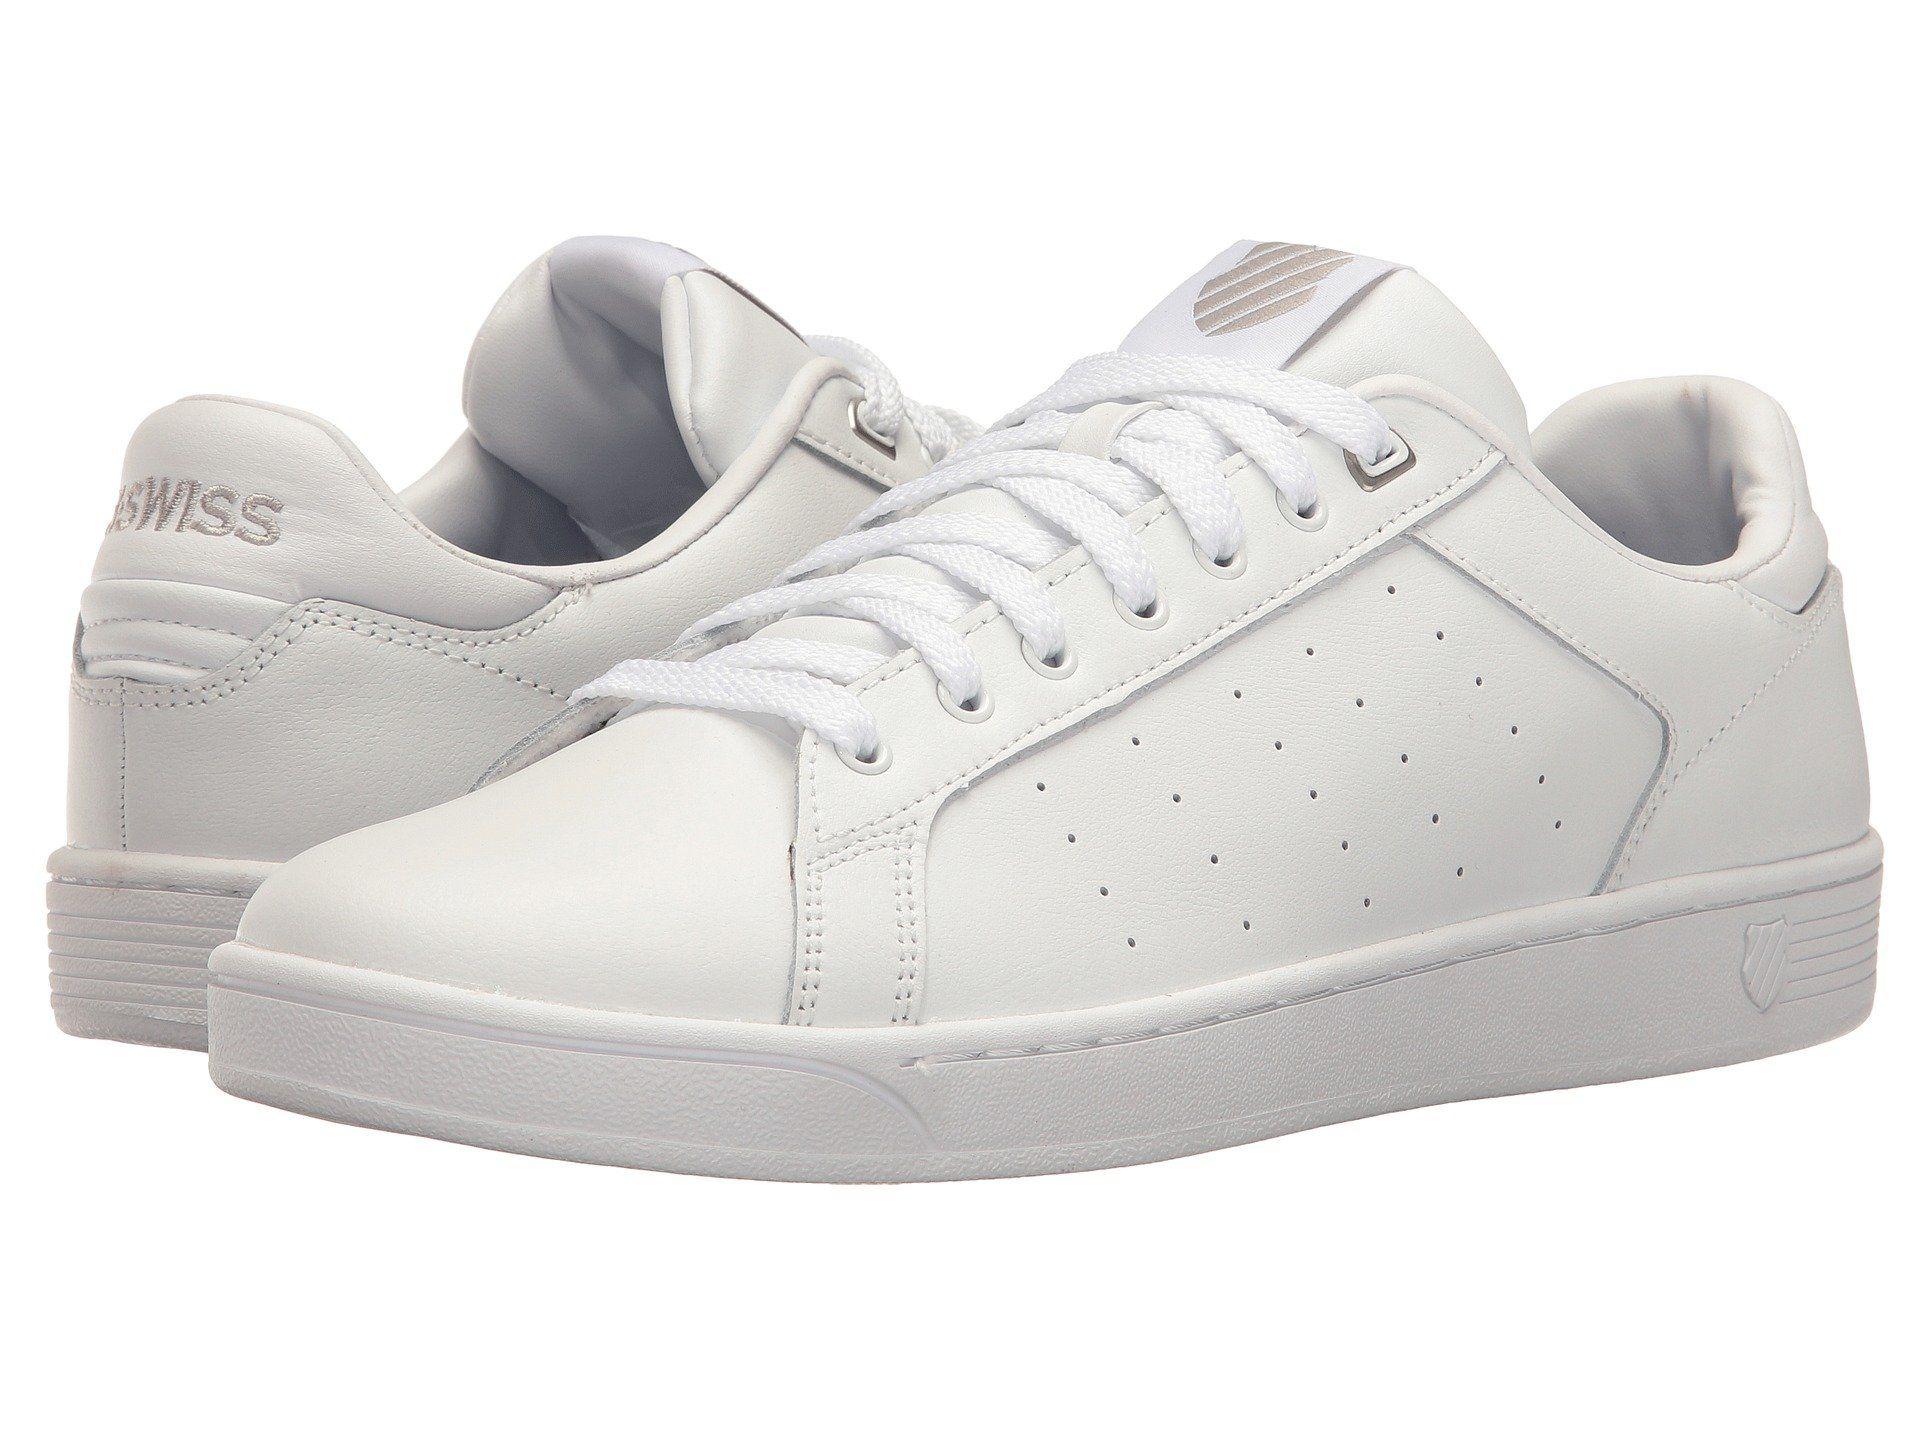 K-swiss Clean Court Cmf, White/gull